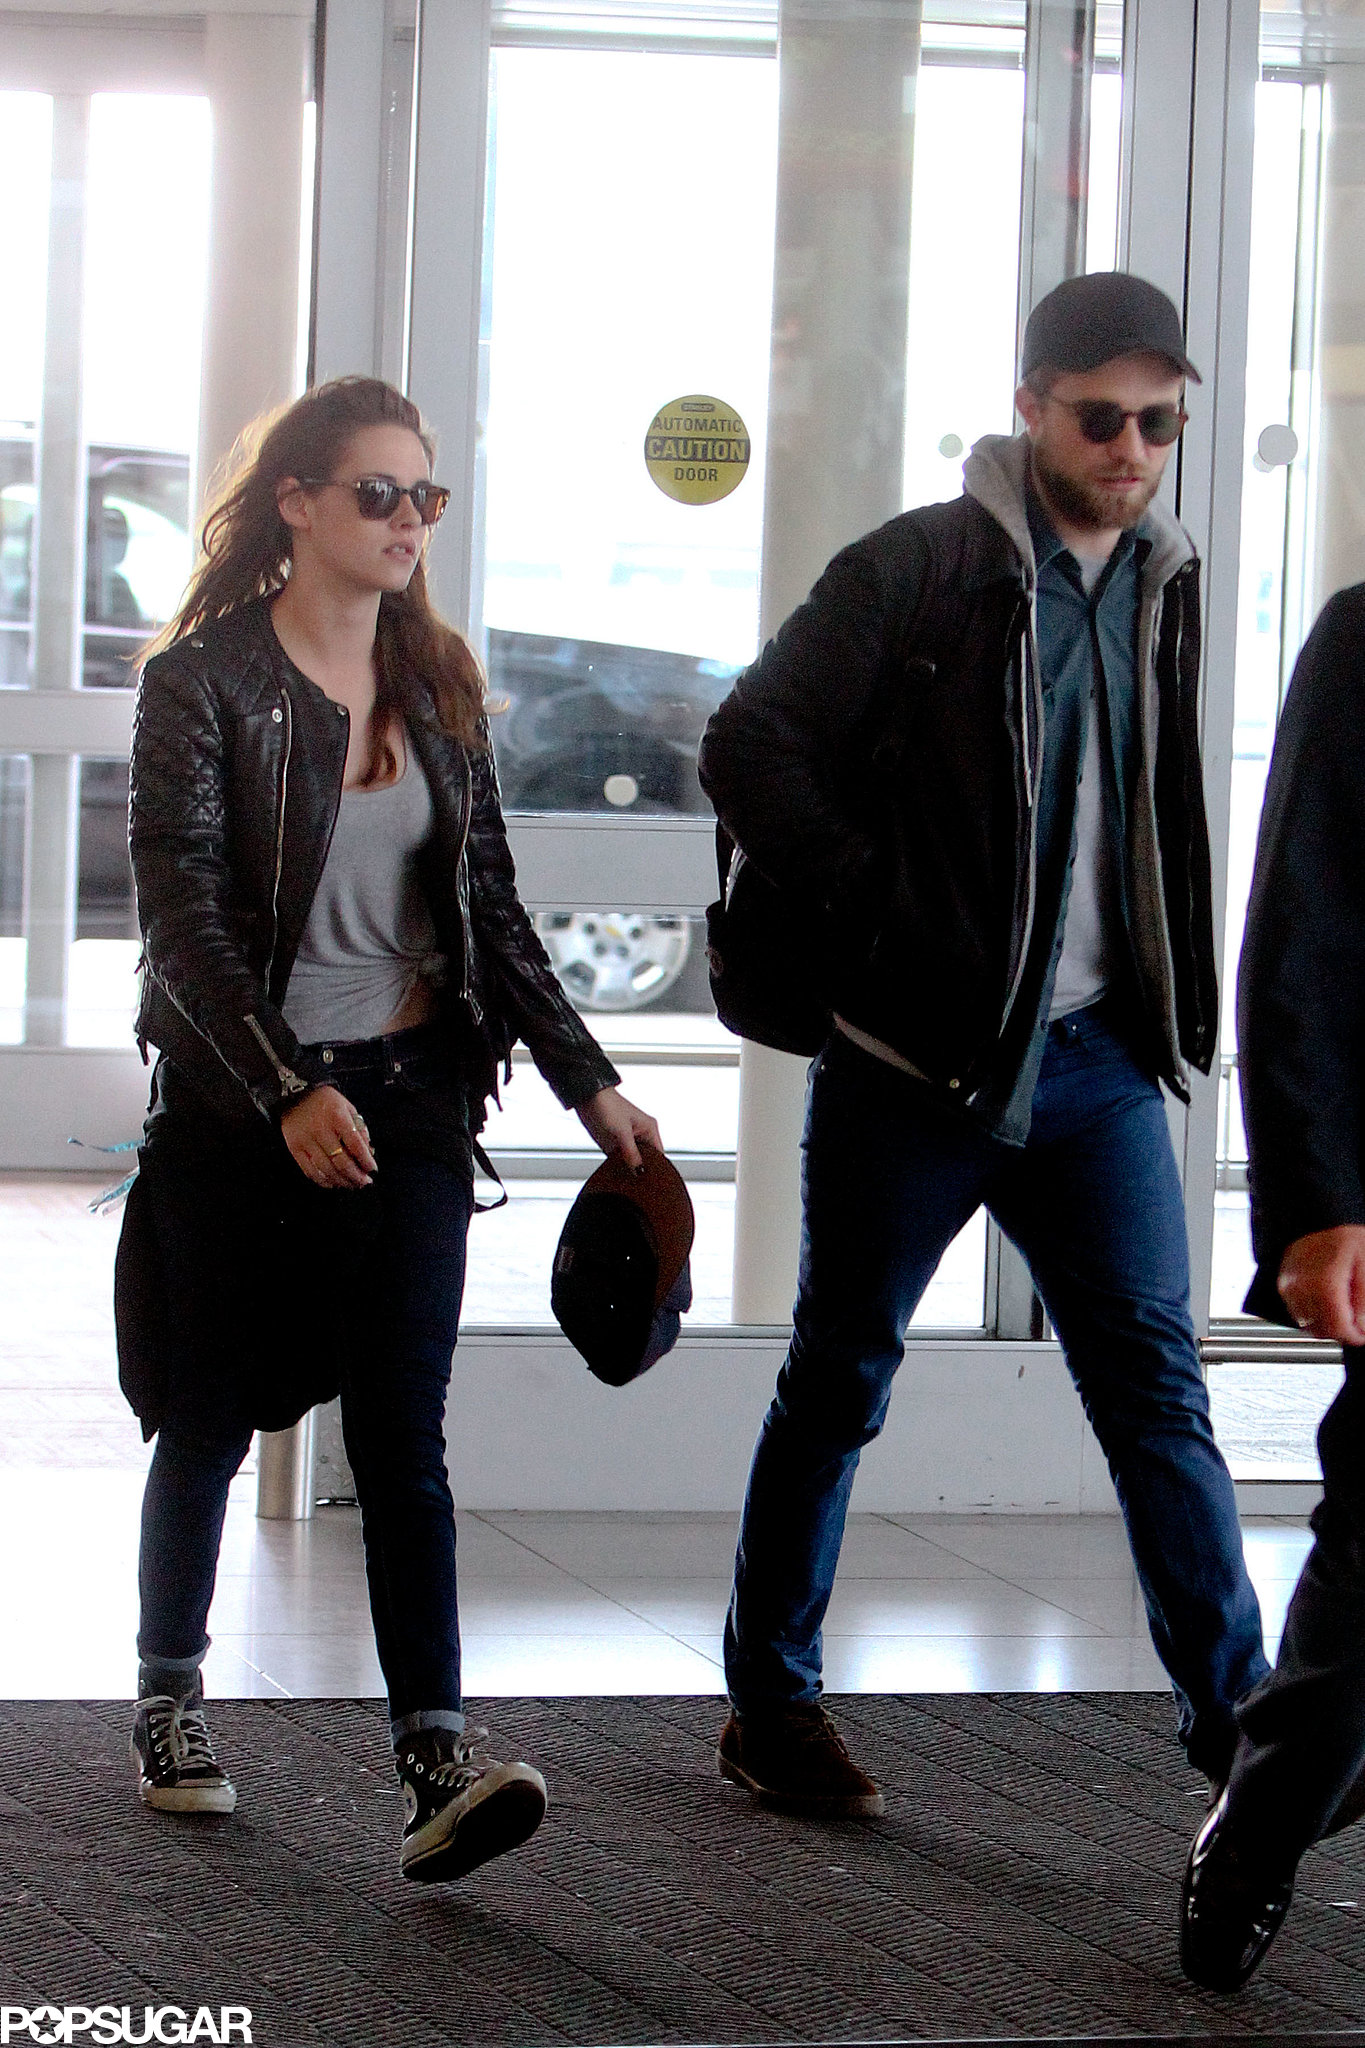 Robert Pattinson and Kristen Stewart arrived at JFK together.